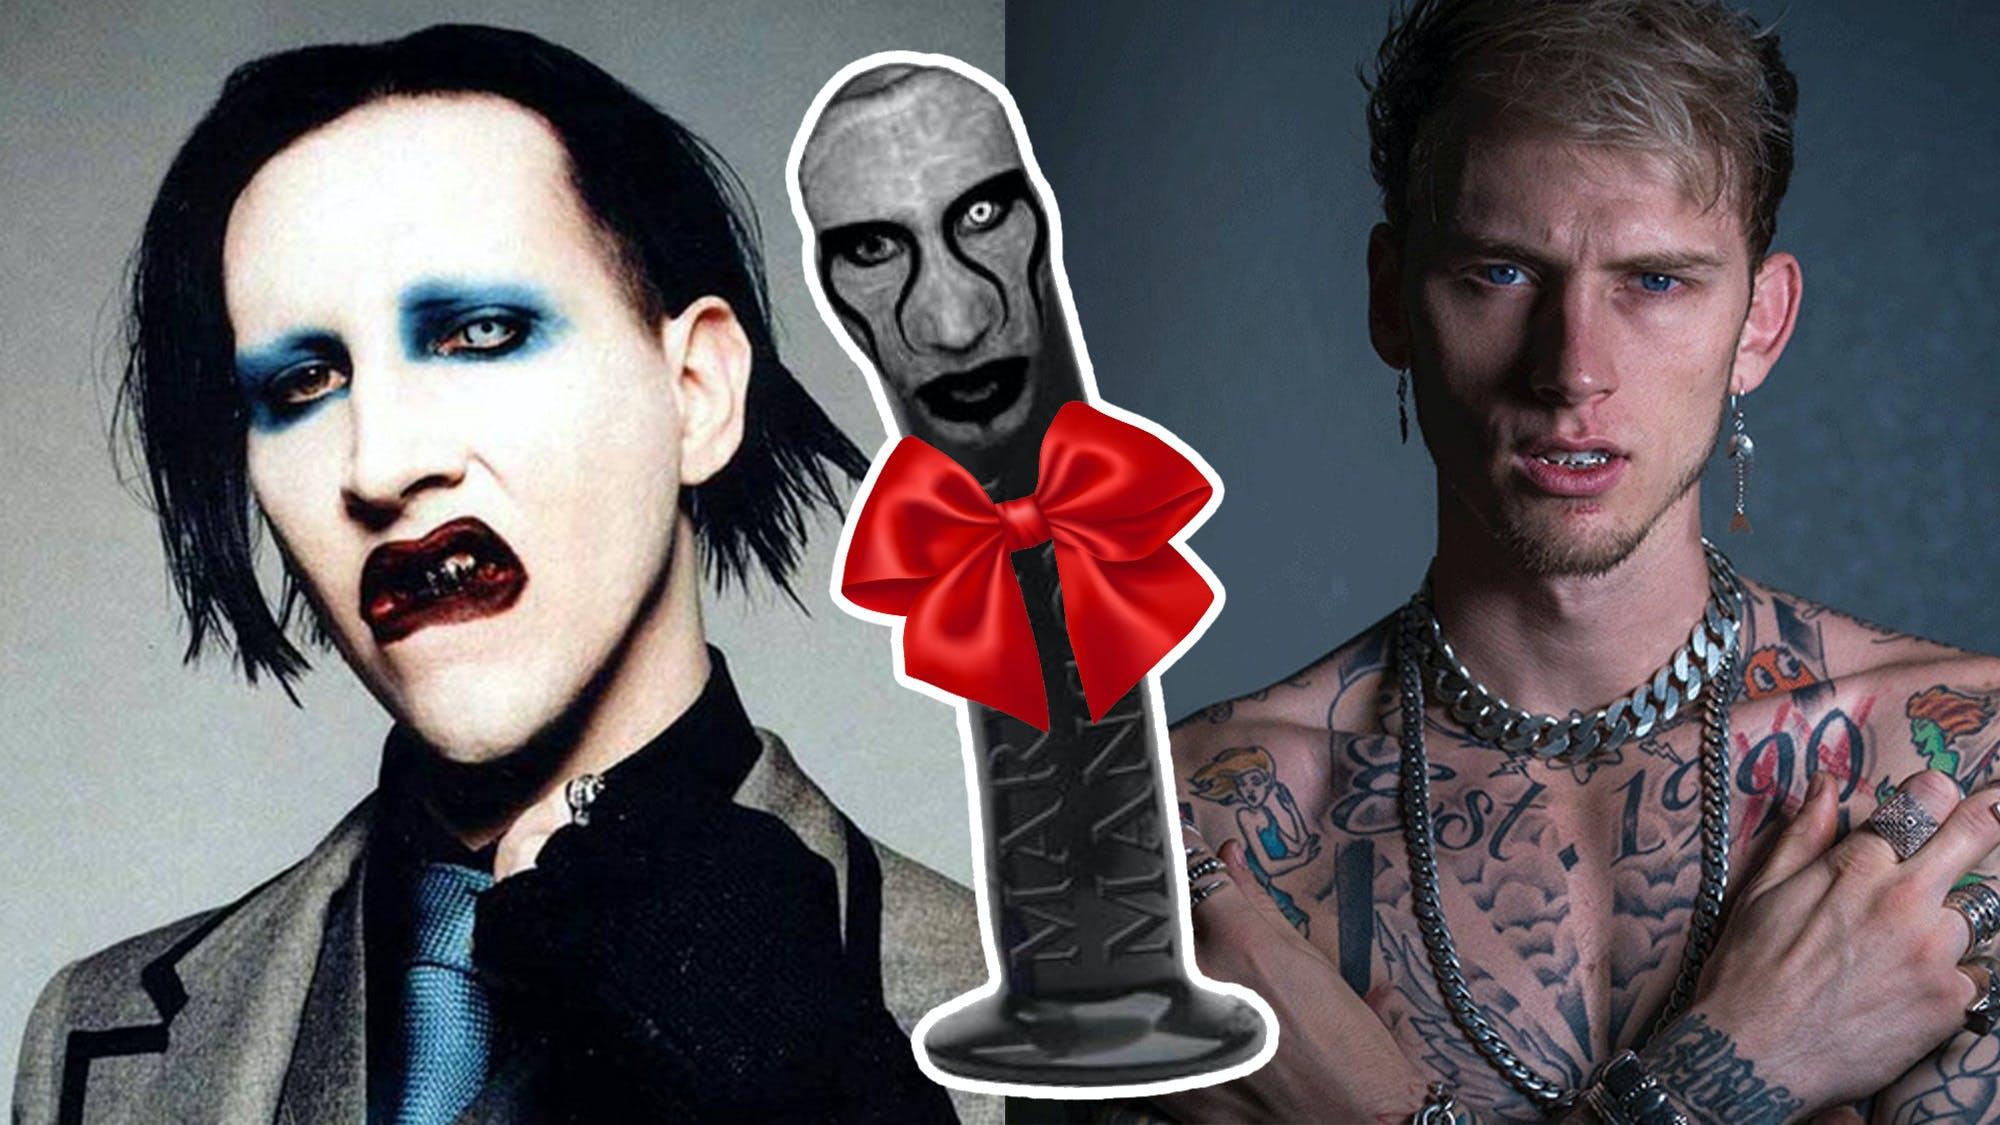 Marilyn Manson Gave A Dildo To Machine Gun Kelly For His Birthday